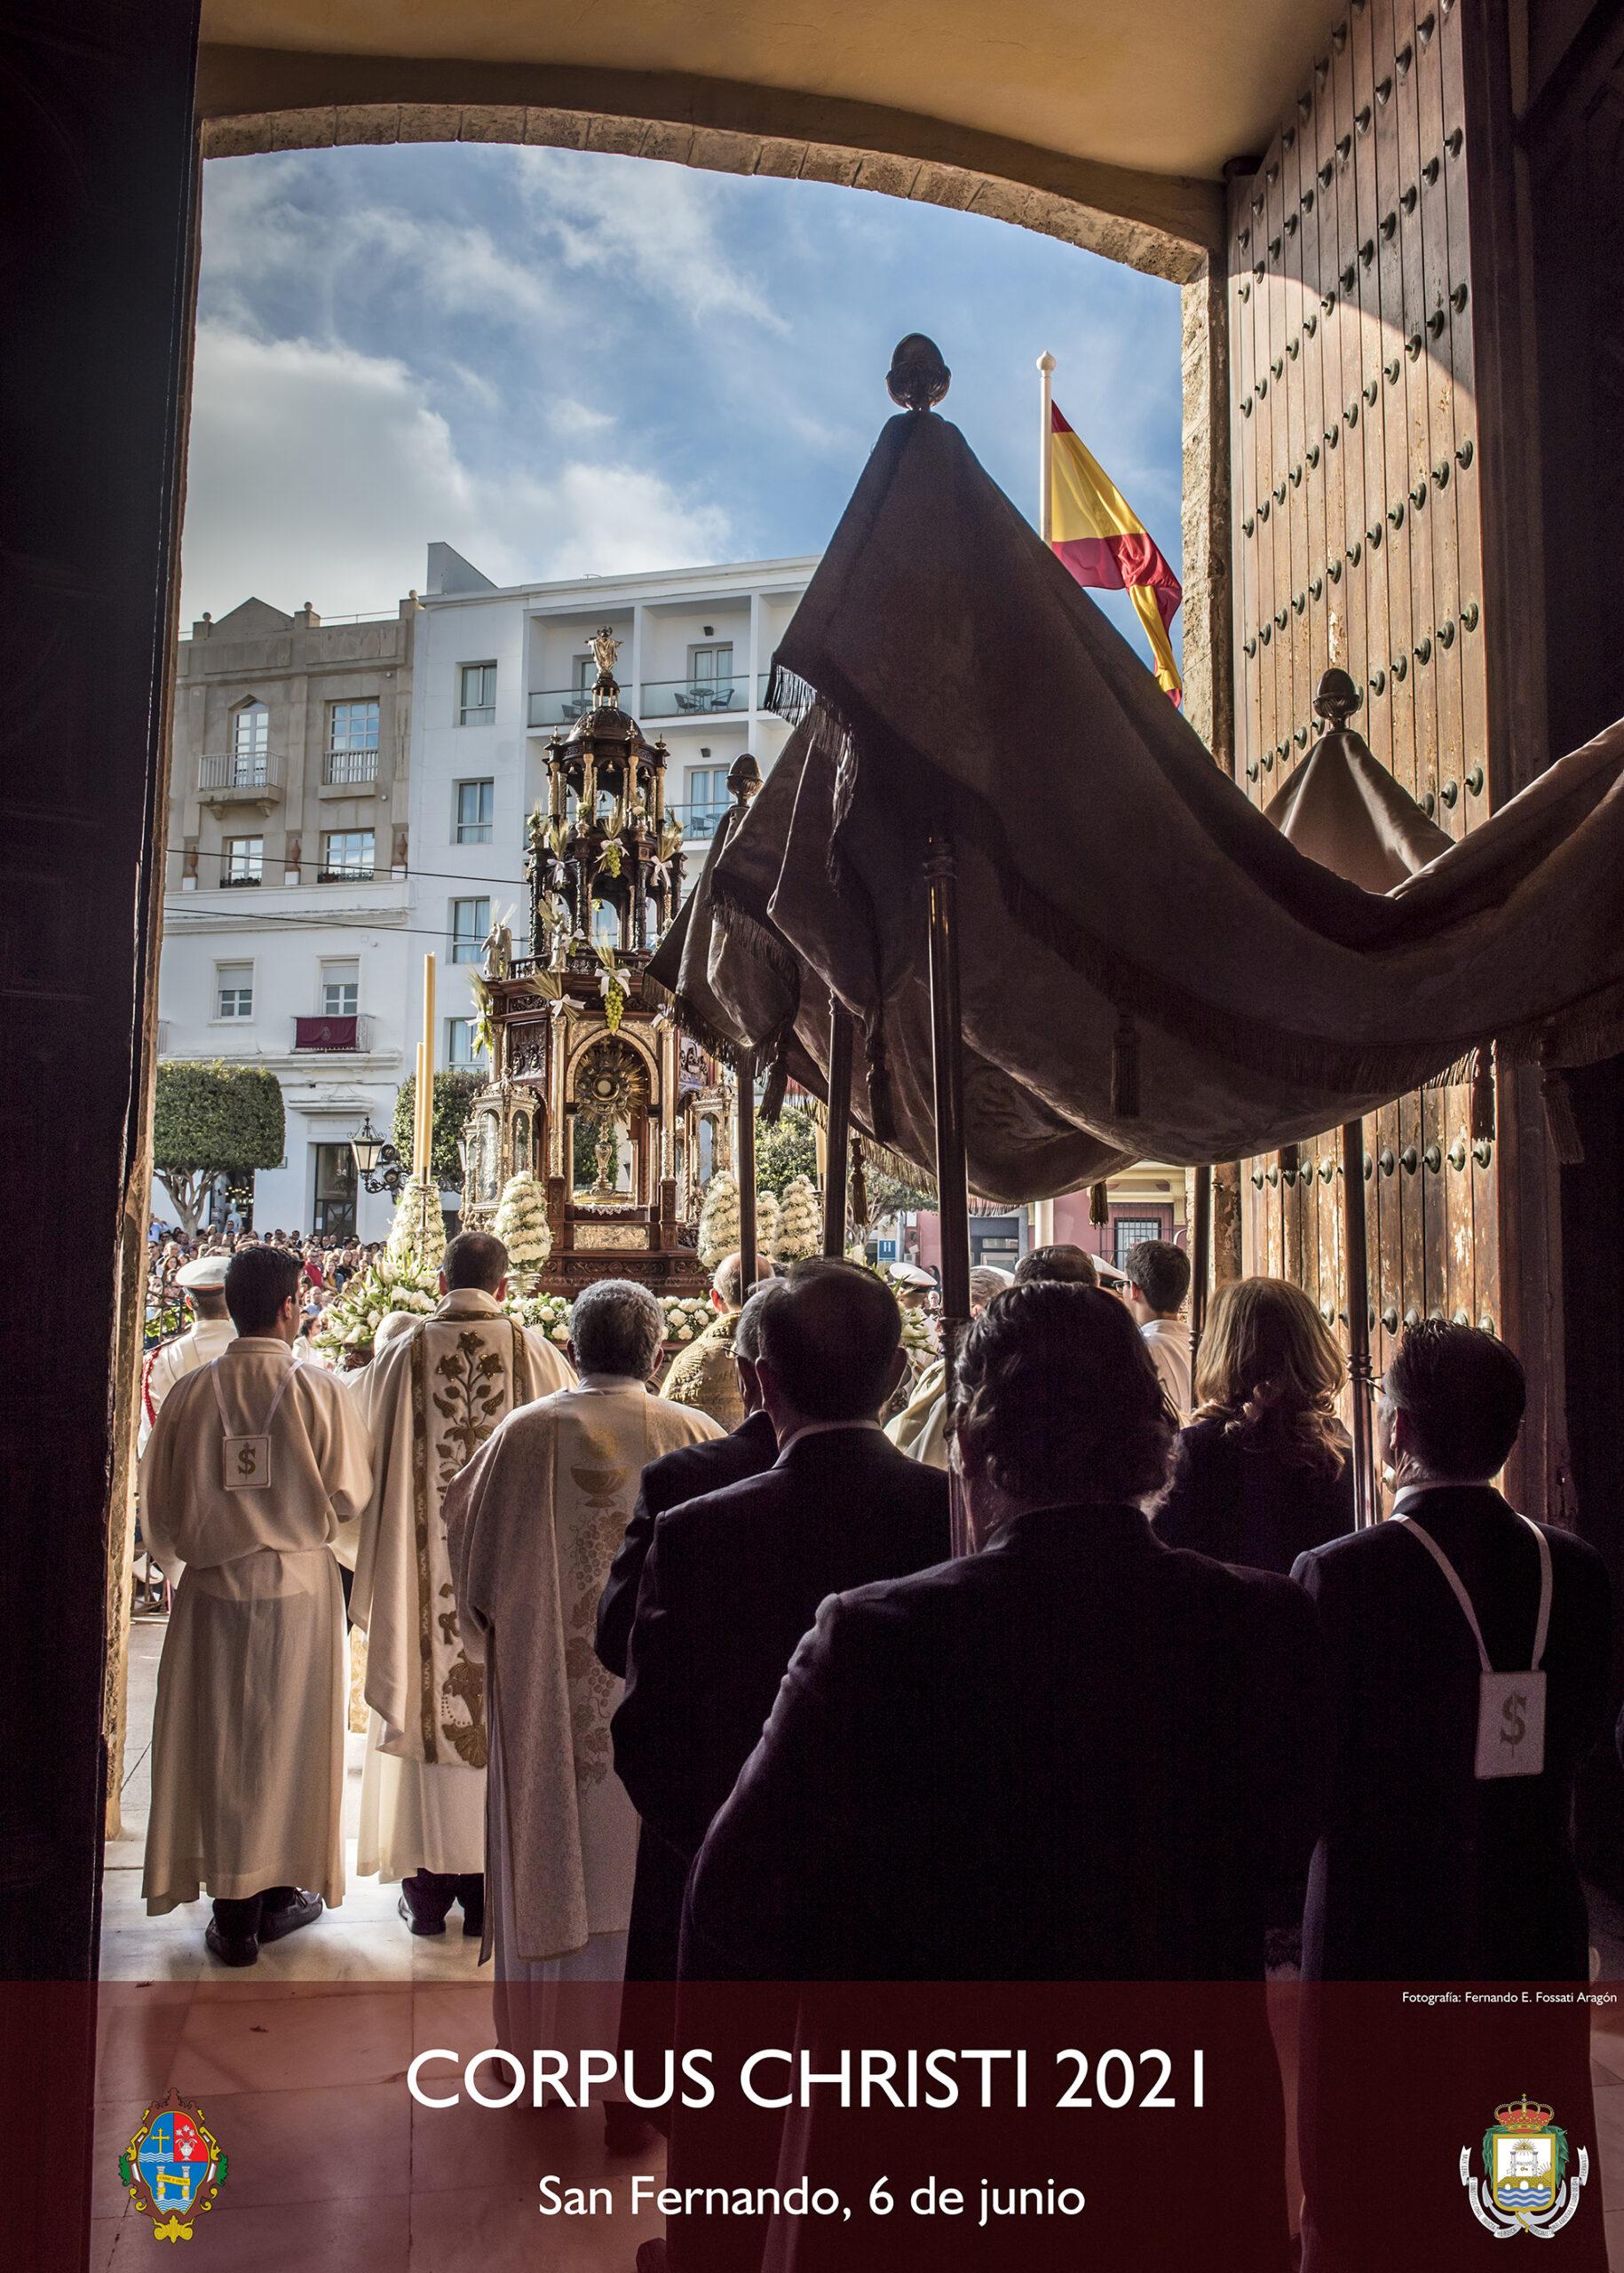 Una foto de FernandoFossati anuncia el Corpus Christi